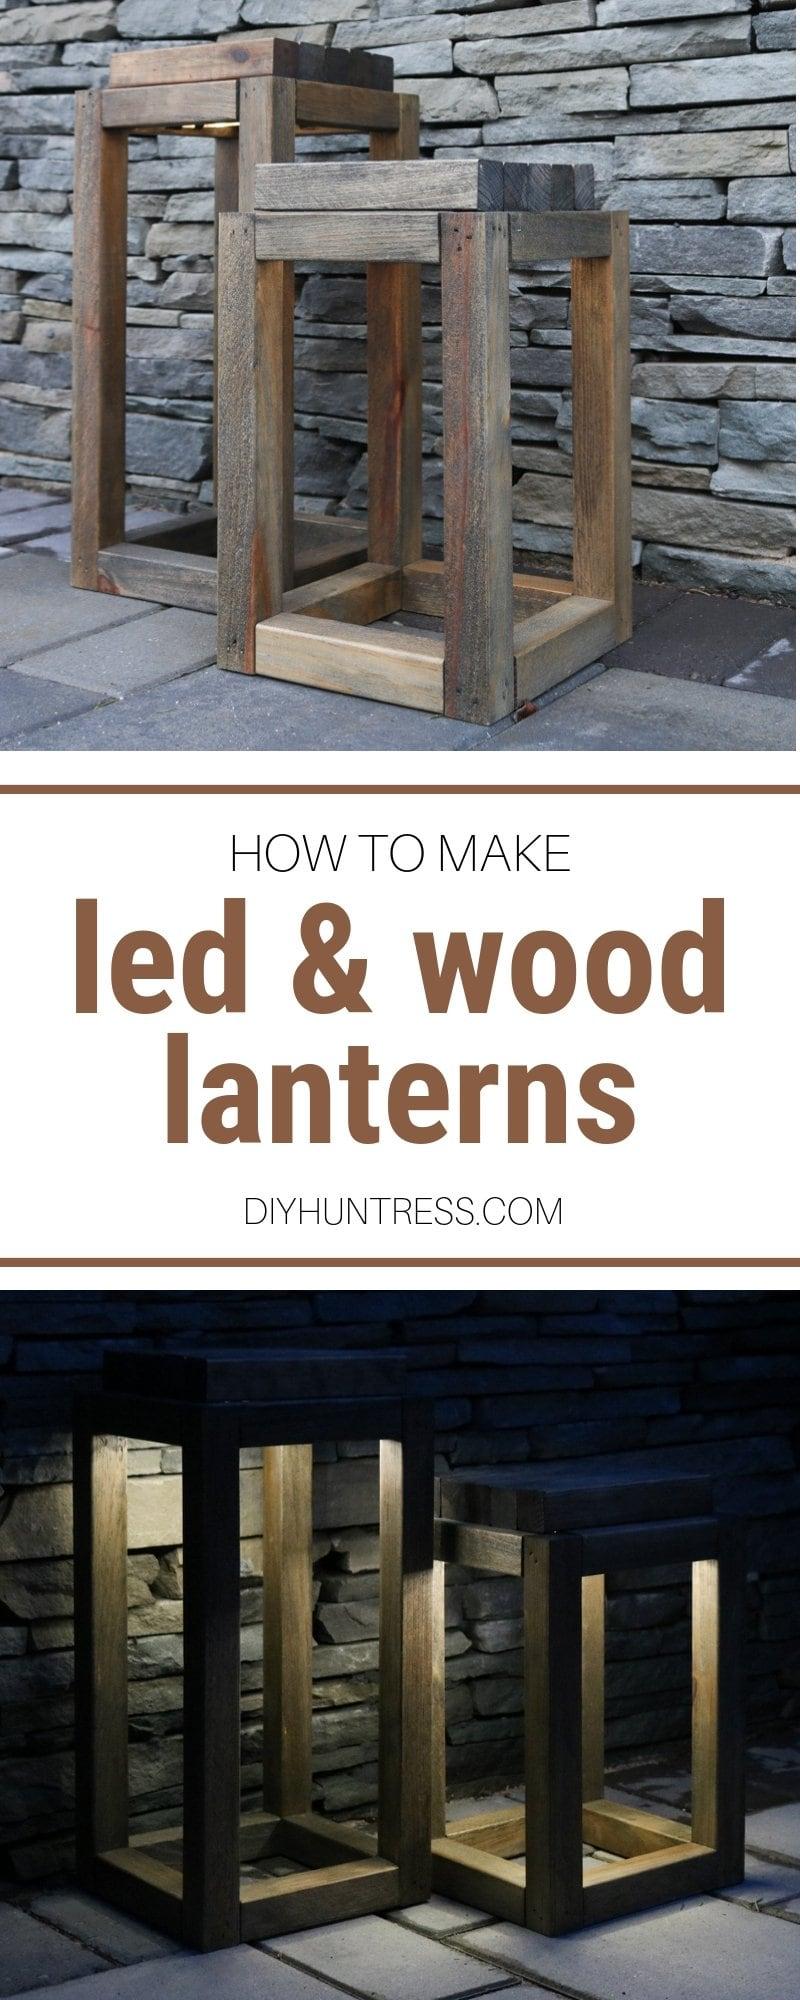 DIY Wooden Lanterns With LED Lights